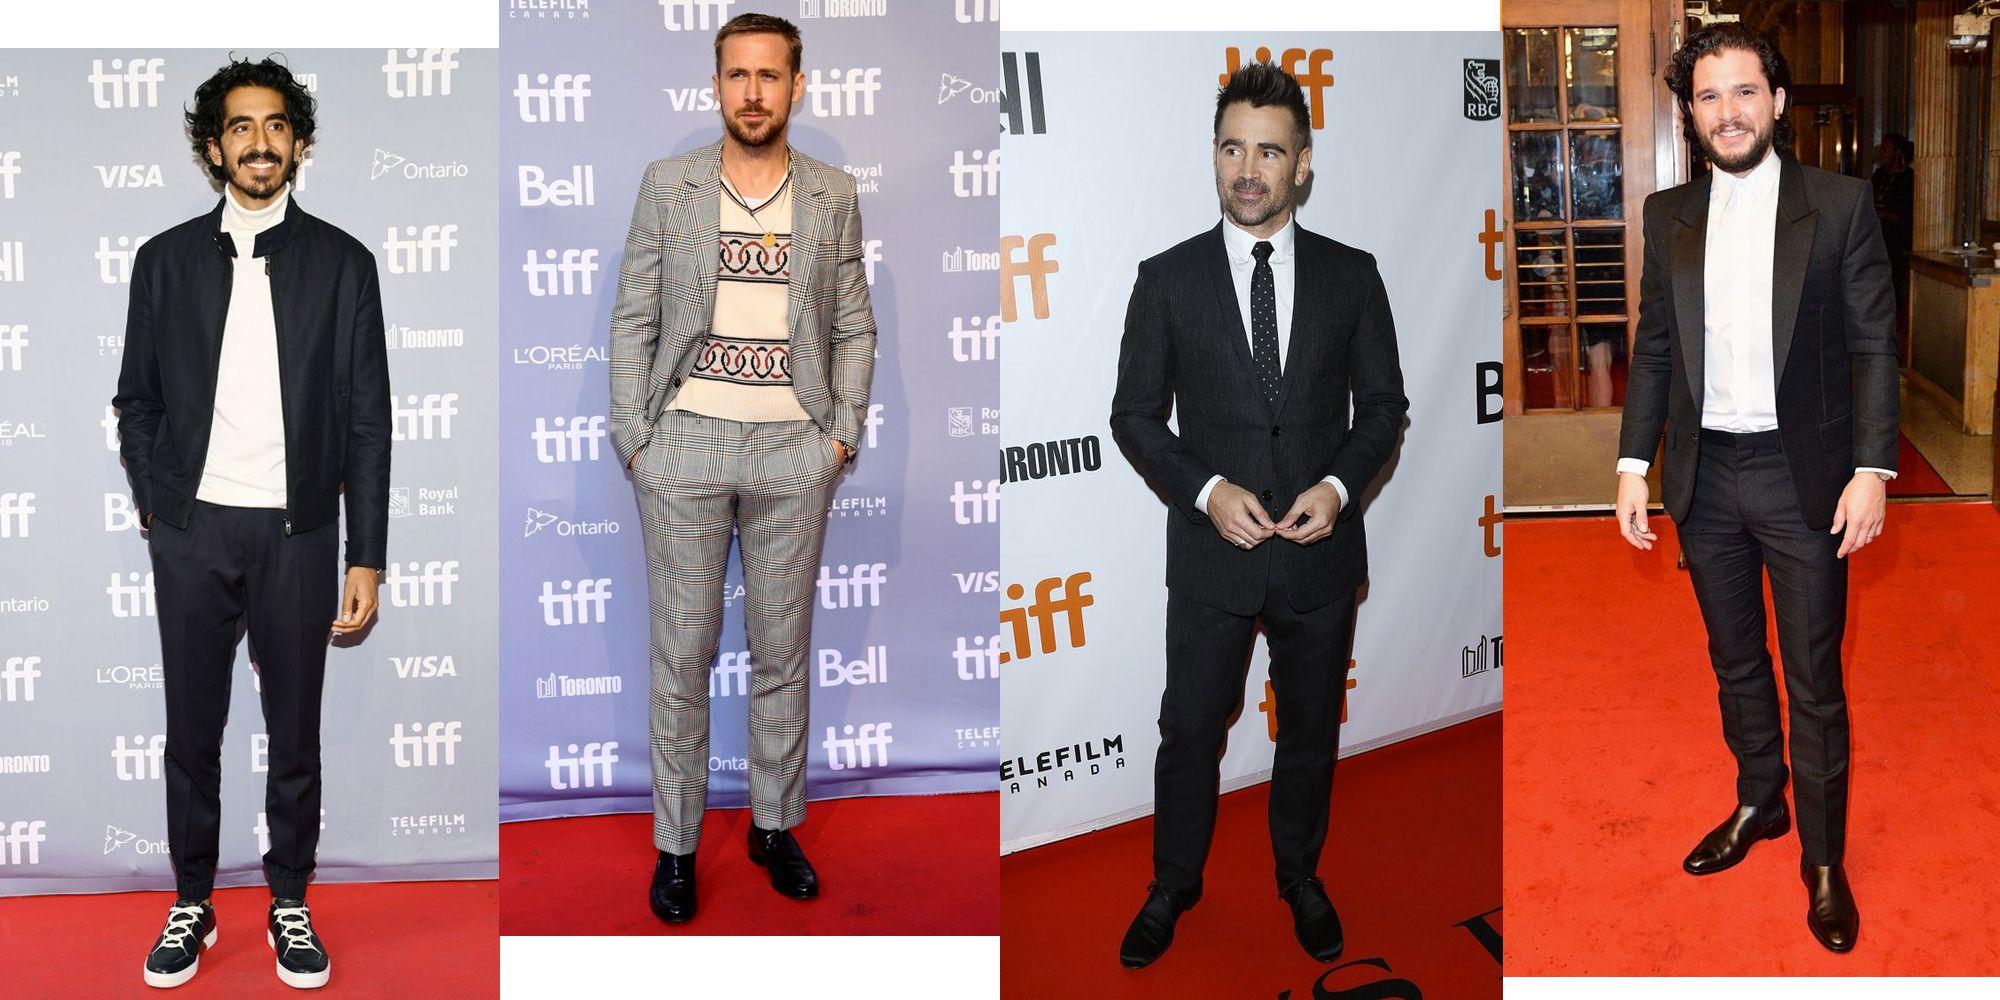 the best-dressed men of the week